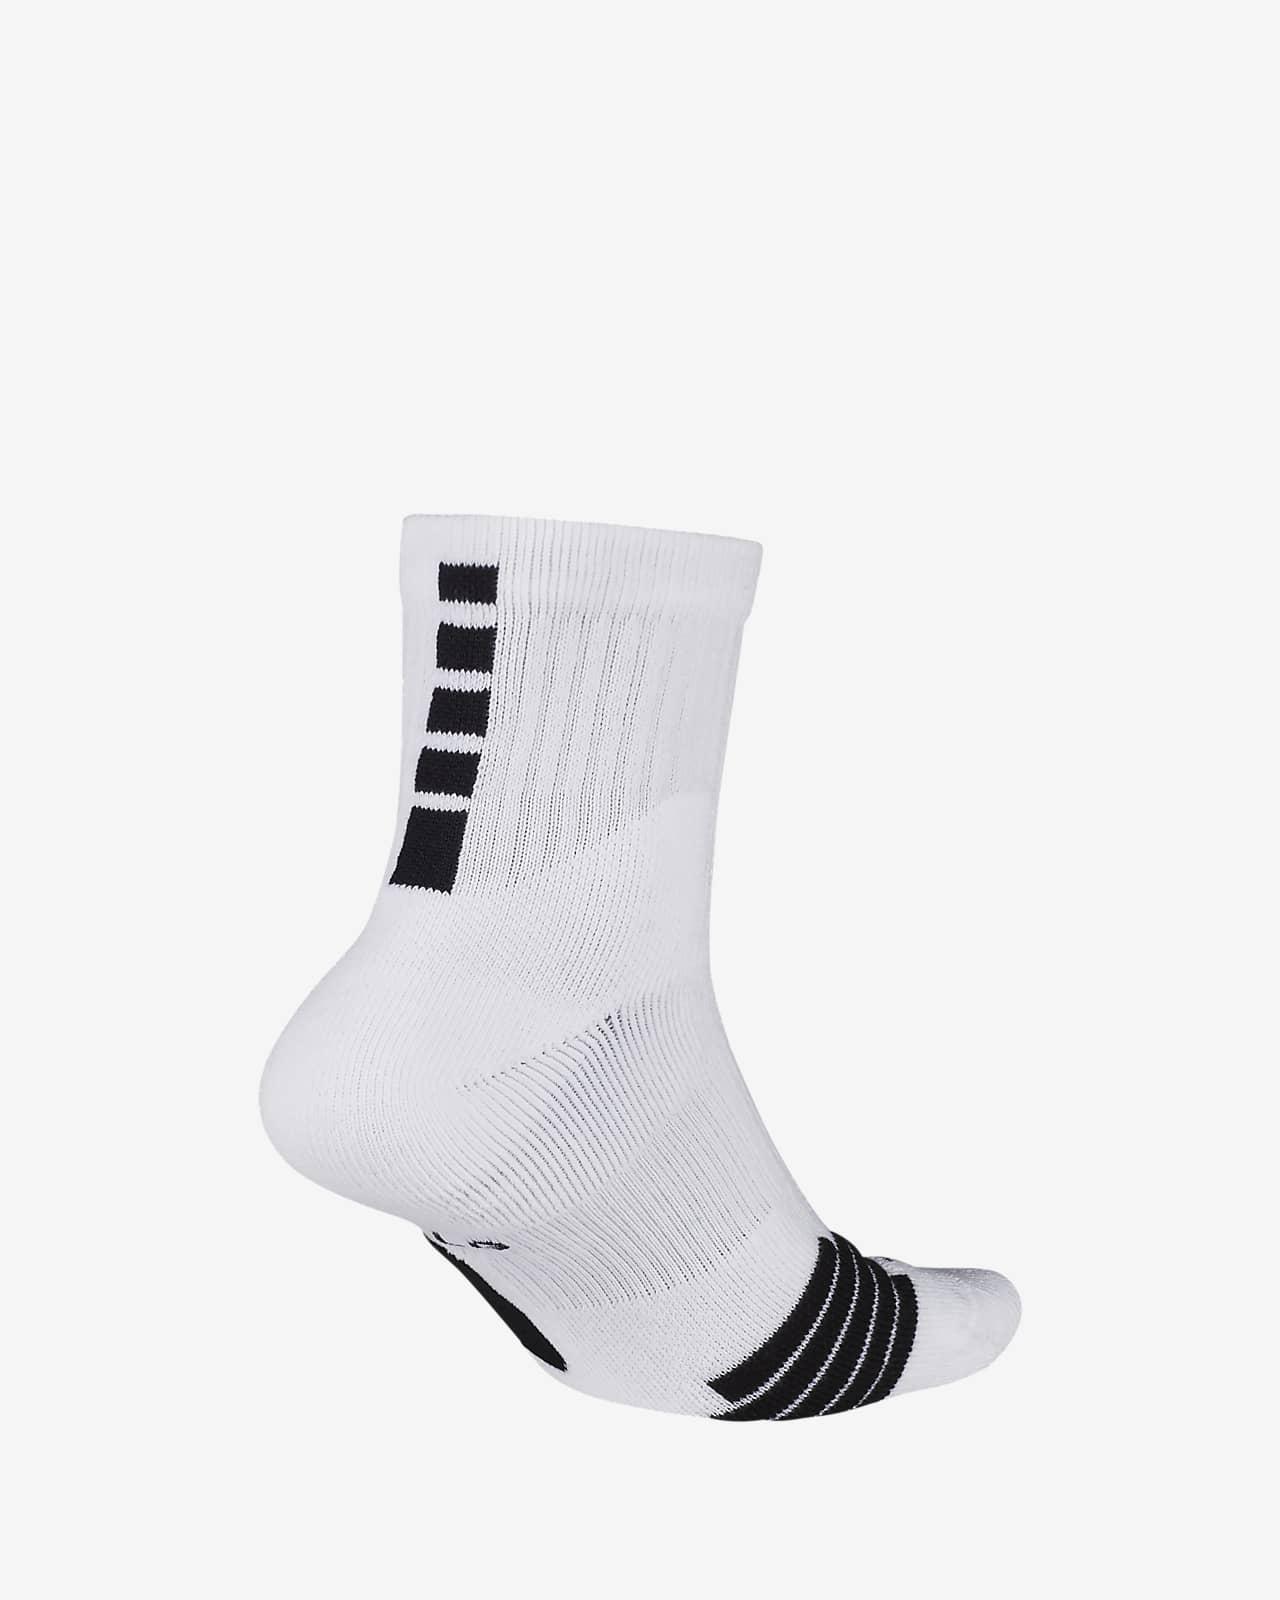 Calcetines de básquetbol Nike Elite Mid